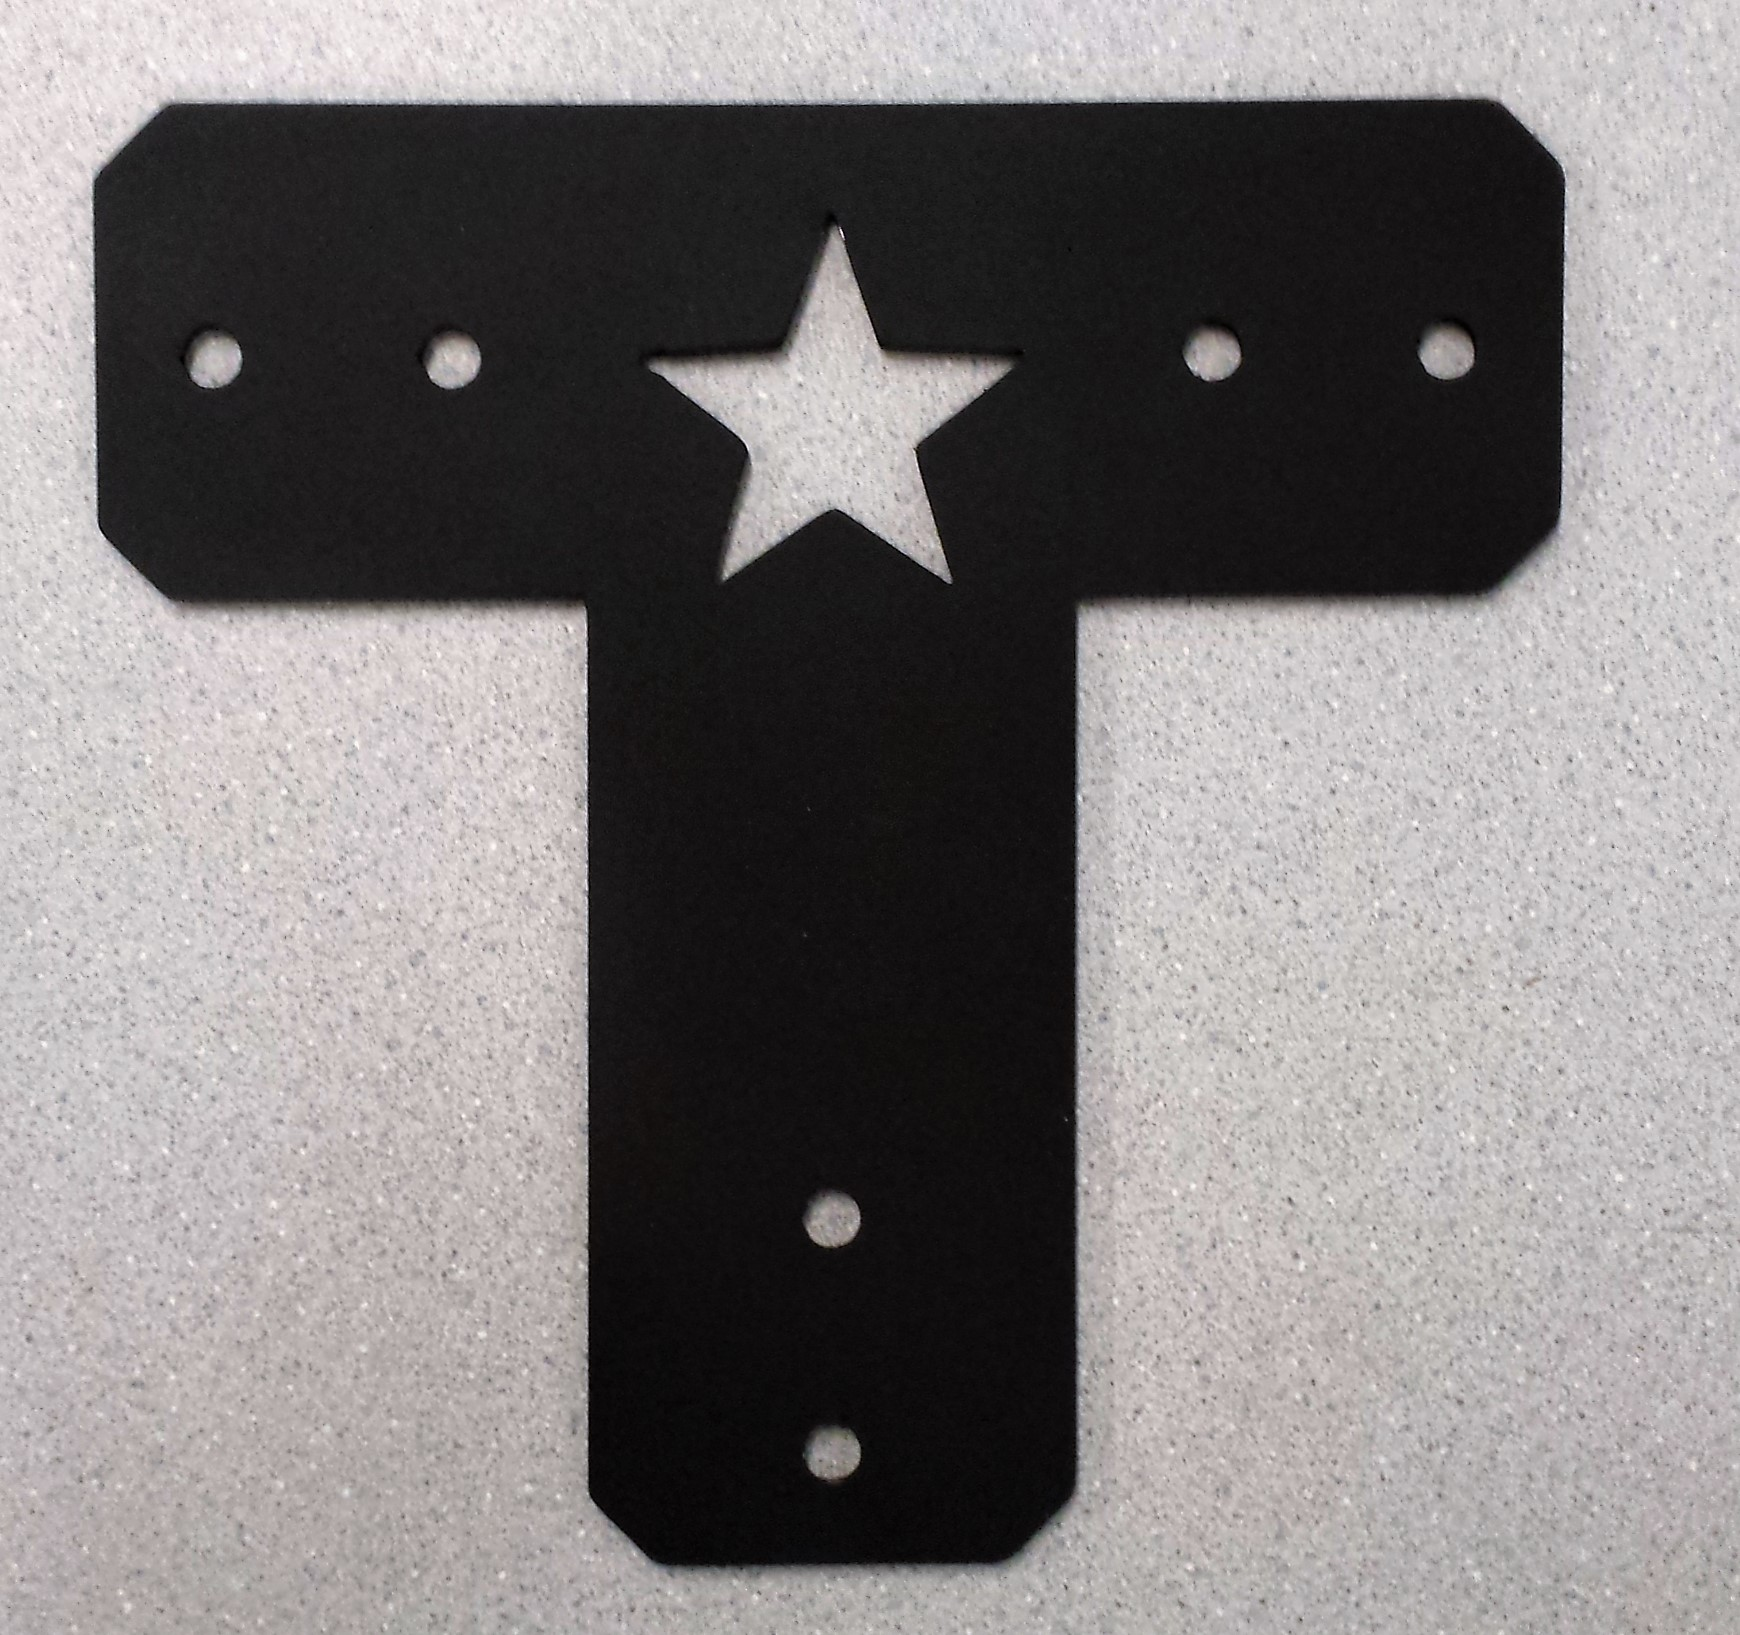 dtb-12-star-2.jpg